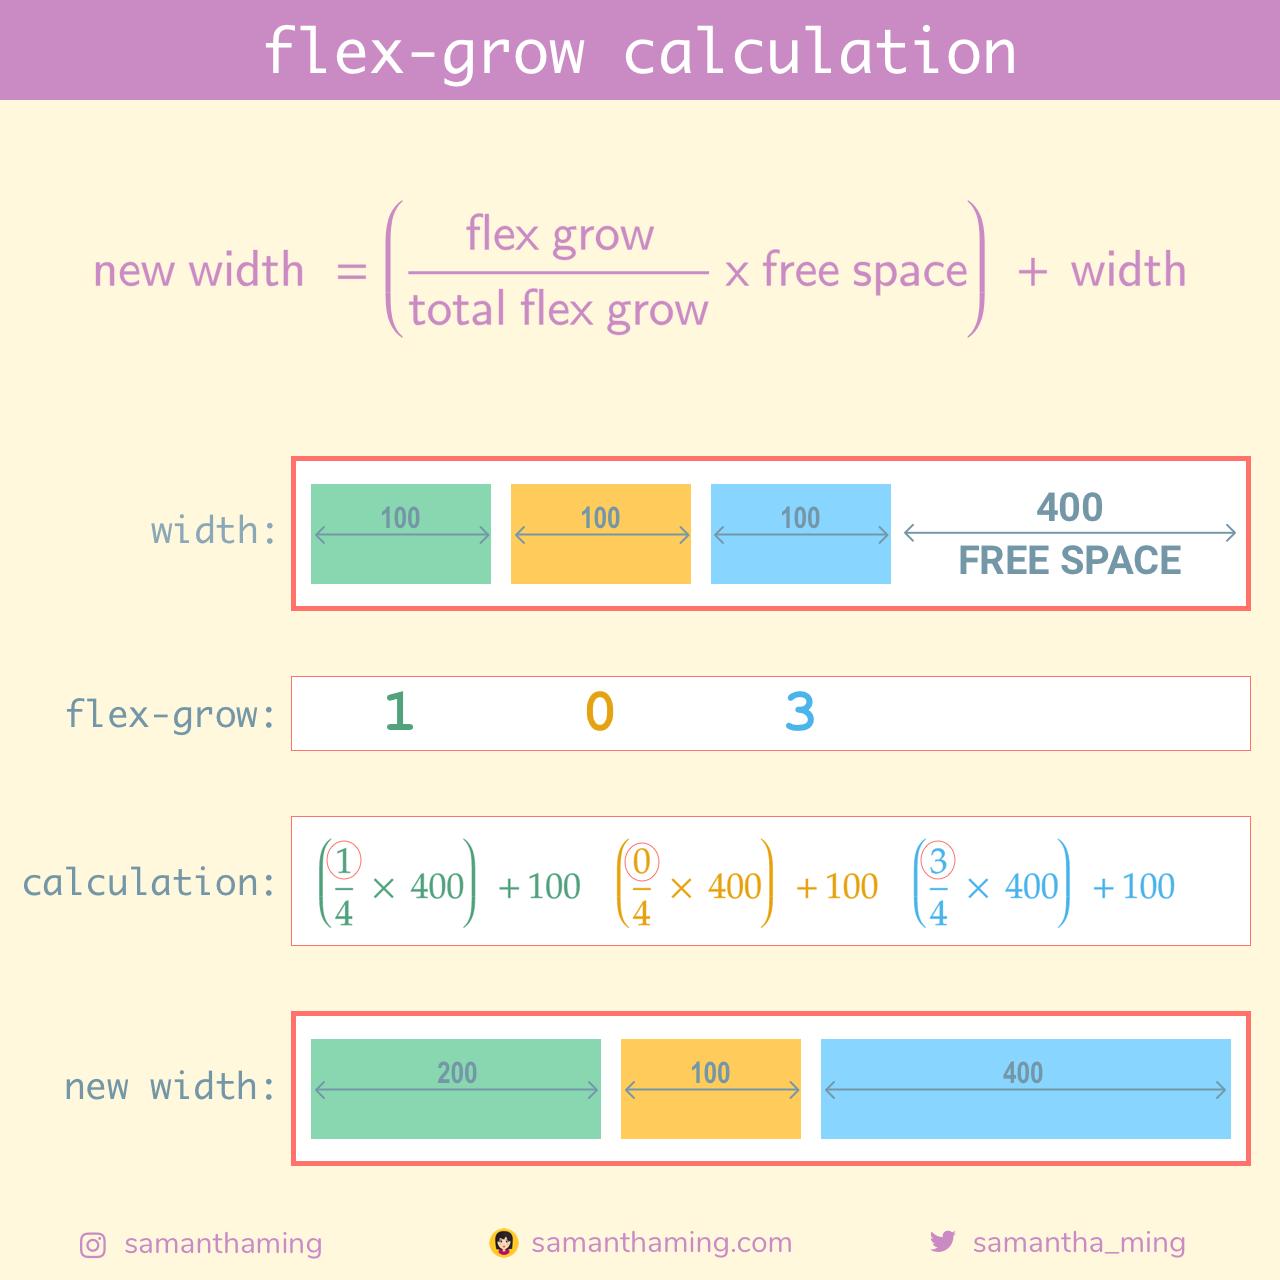 flex-grow calculation